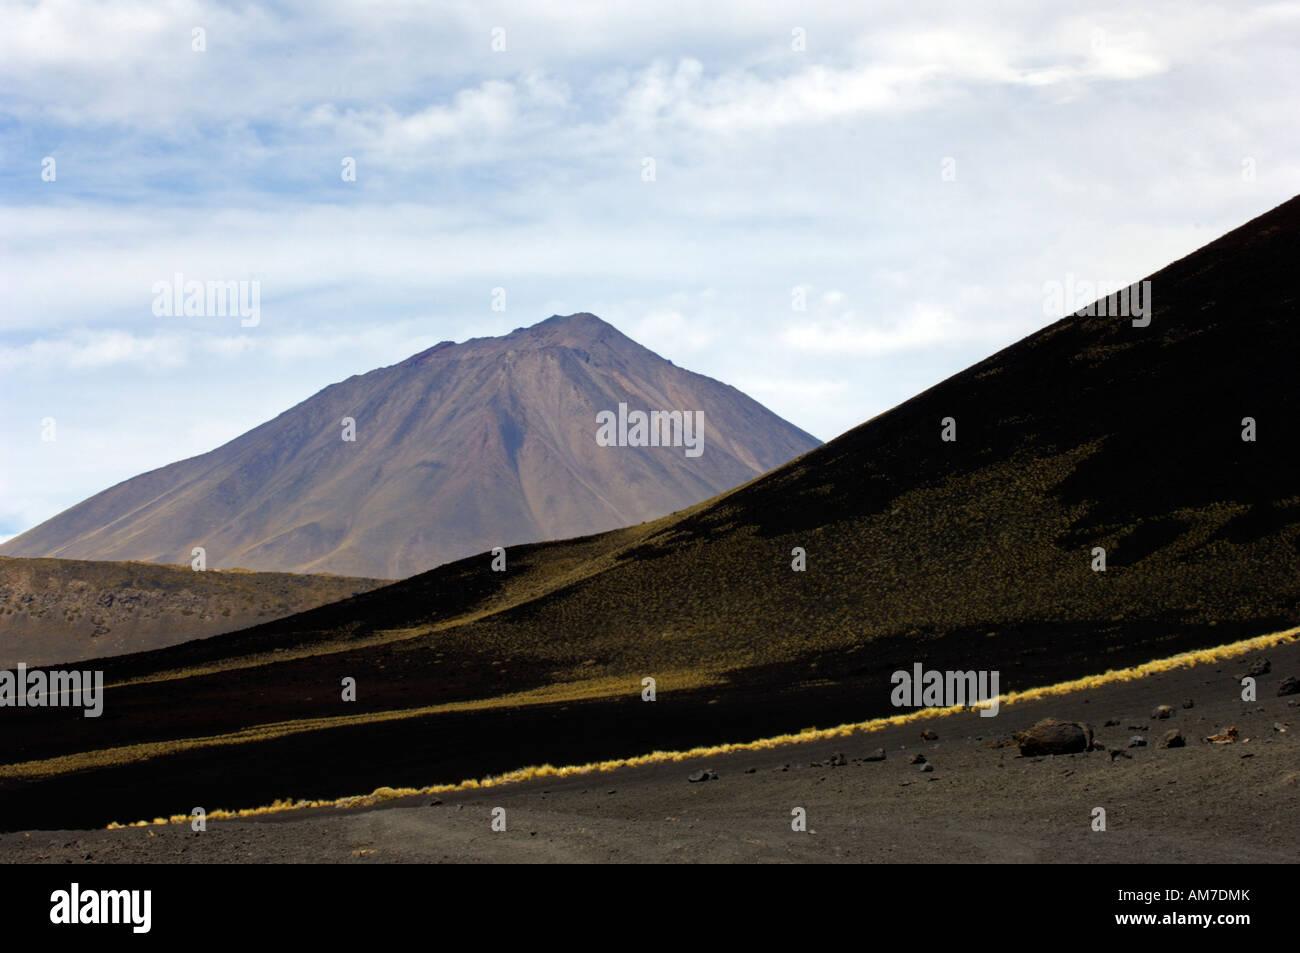 The volcanic landscape of Payunia Provincial Reserve in Malargue, Mendoza Province, Argentina Stock Photo